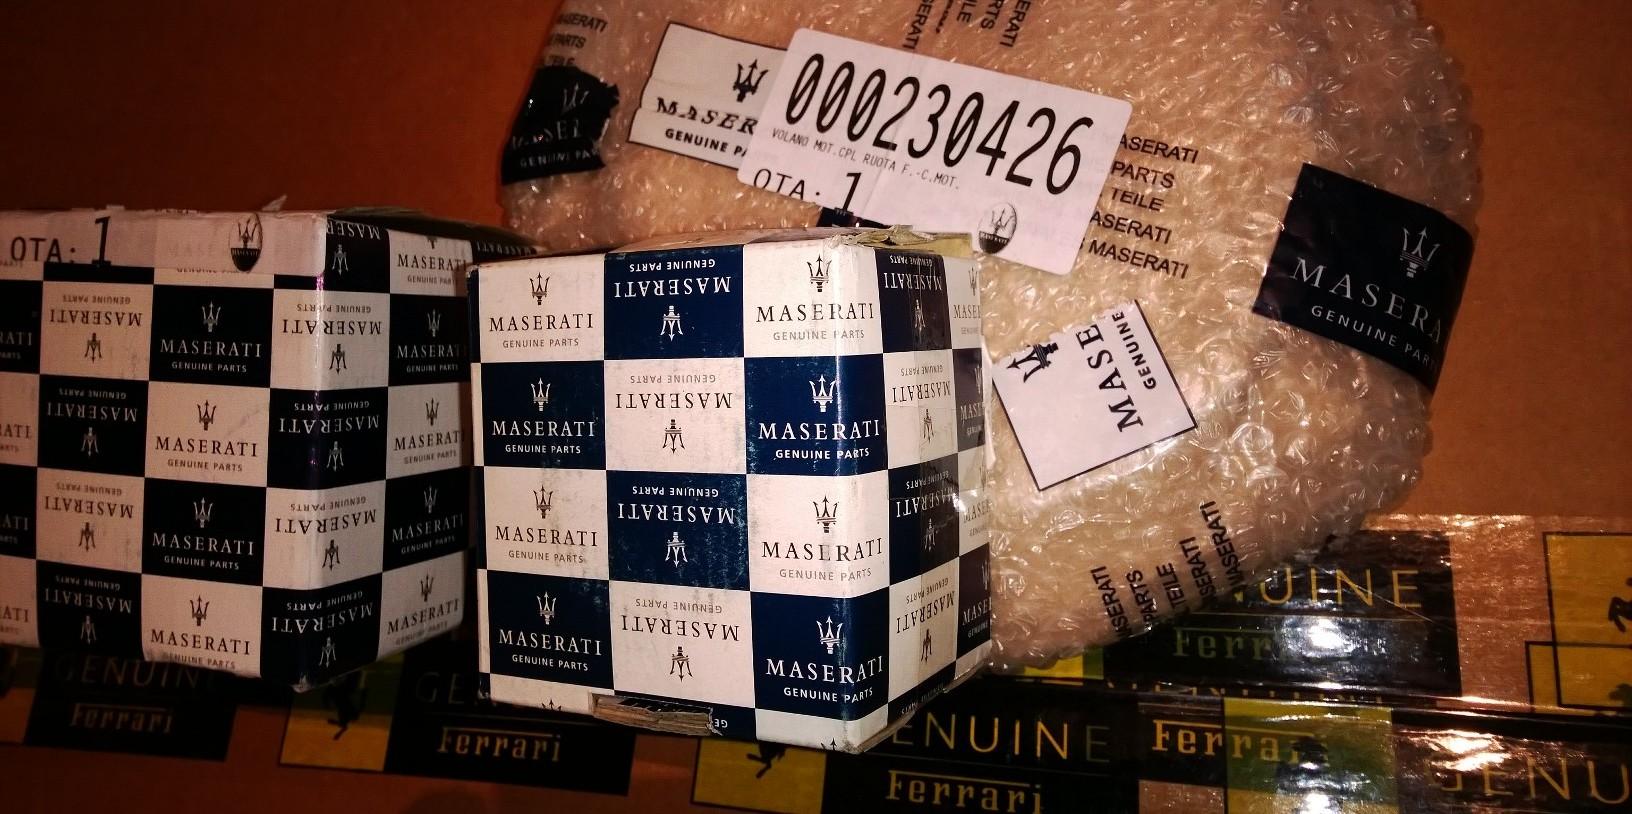 Запчасти Maserati запчасти Мазерати Maserati Quattroporte Maserati Ghibli III,Maserati GranTurismo Maserati GranCabrio Maserati 3200 GT Maserati 420/430 Maserati 4300 GT Coupe Maserati Biturbo Maserati Coupe Maserati Ghibli Maserati Gransport Maserati Spy